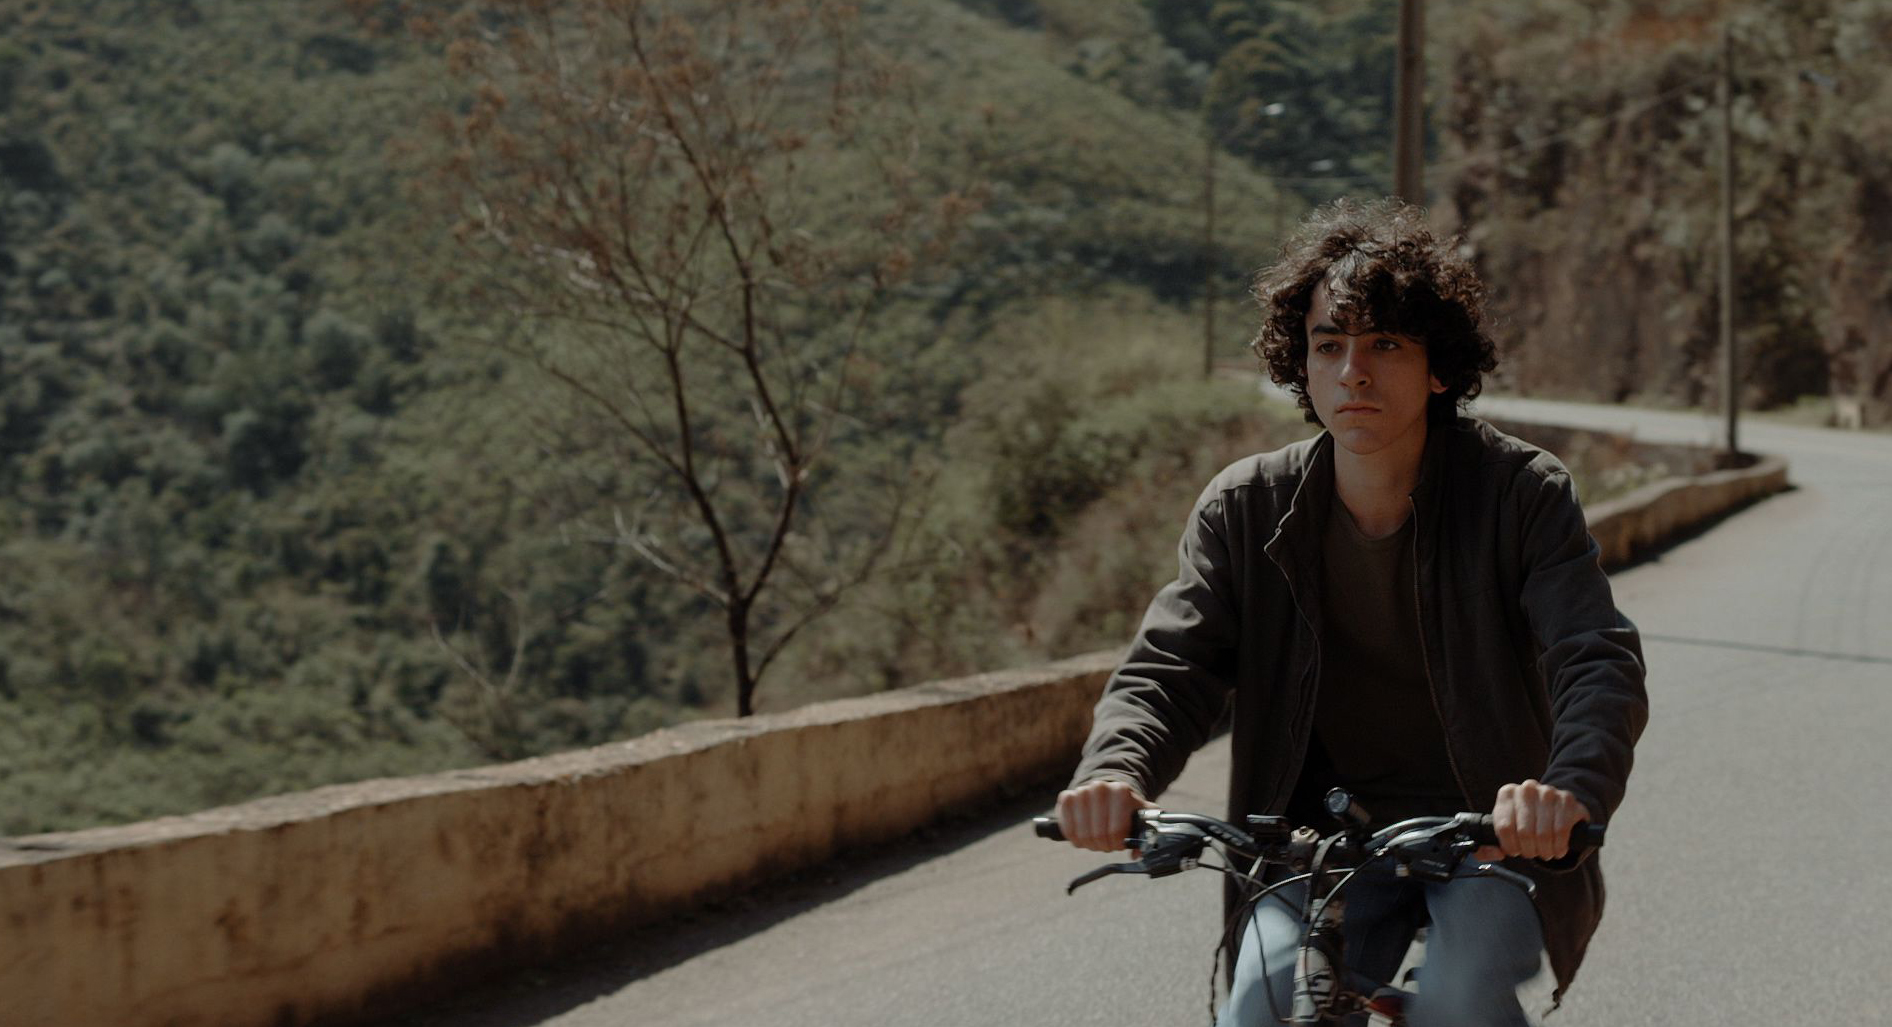 Directed by Affonso Ochoa & João Dumans